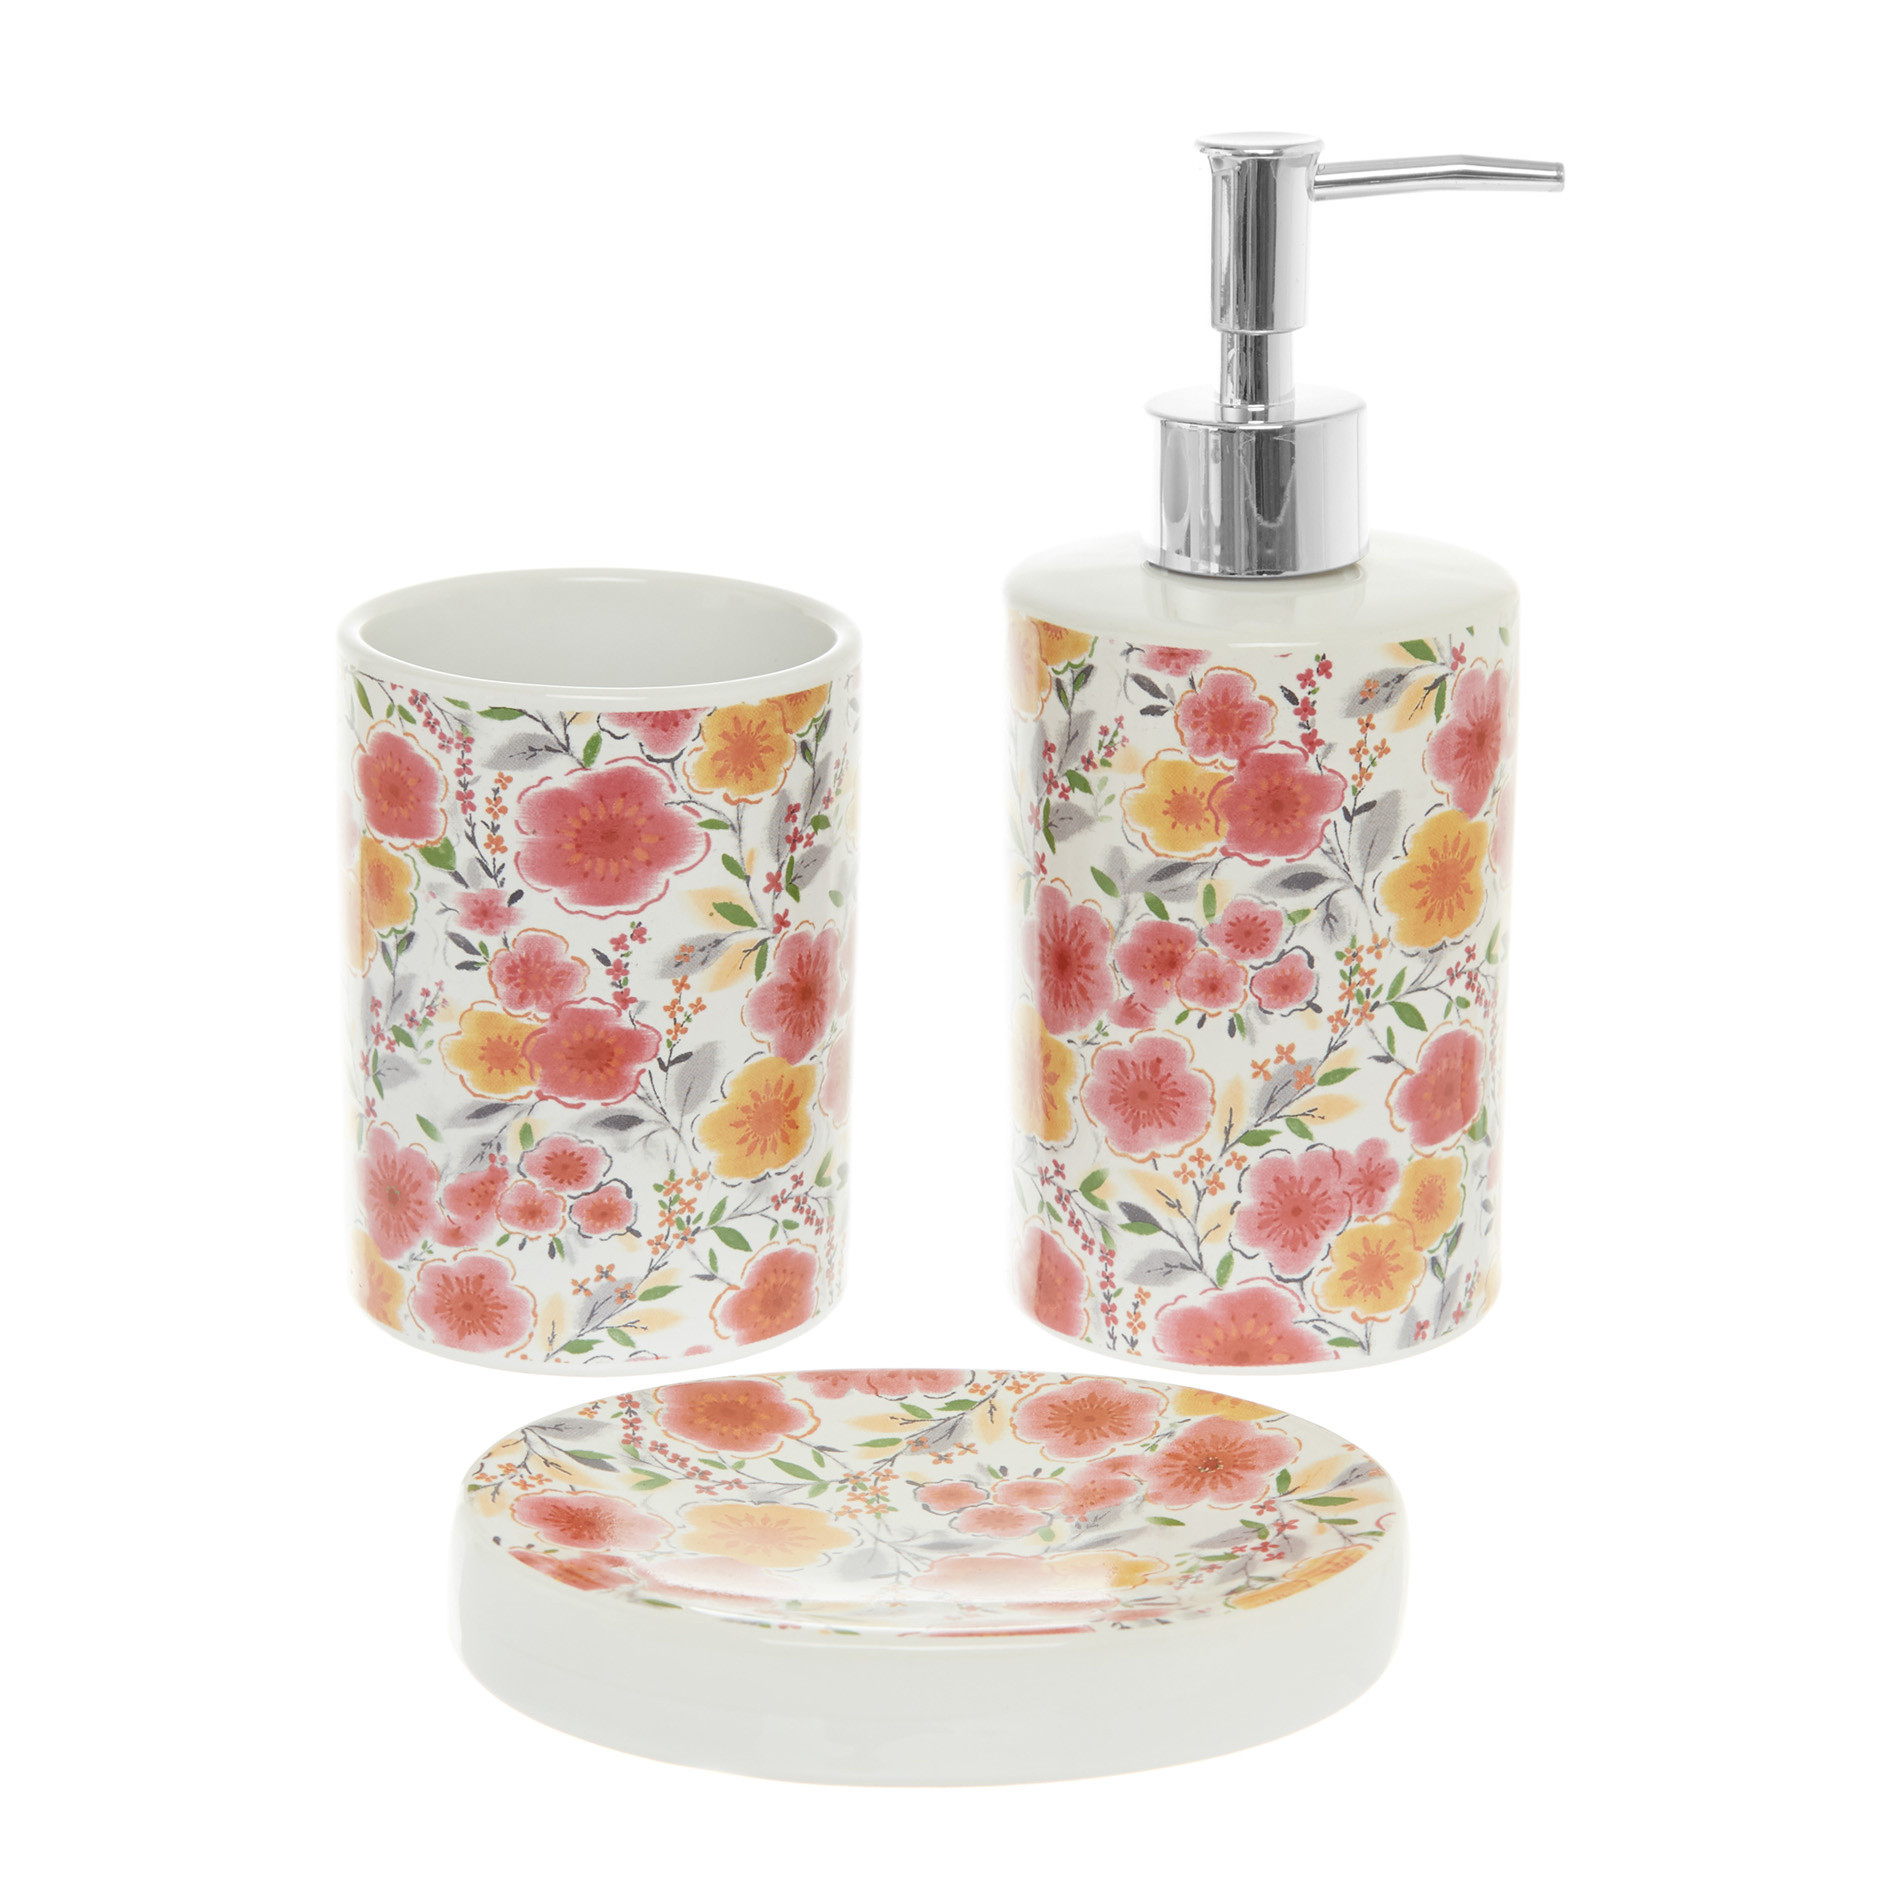 Set 3 accessori da bagno in ceramica motivo fiori, Multicolor, large image number 0